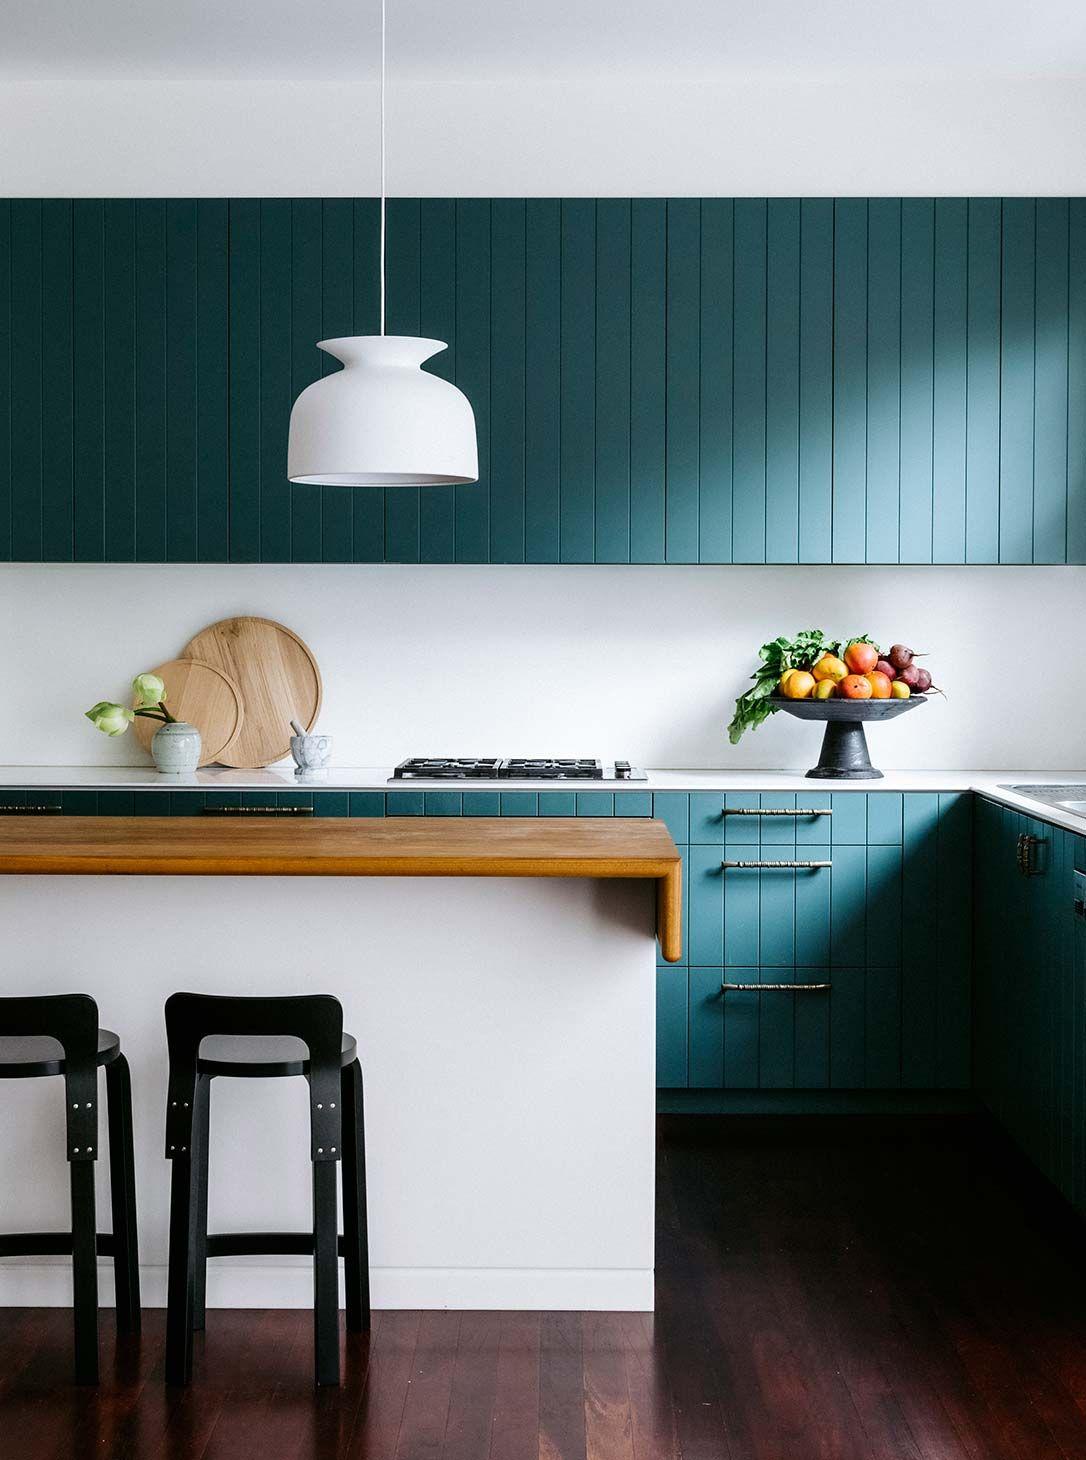 Bronte Beach House   Arent & Pyke   Kitchens   Pinterest   Green ...